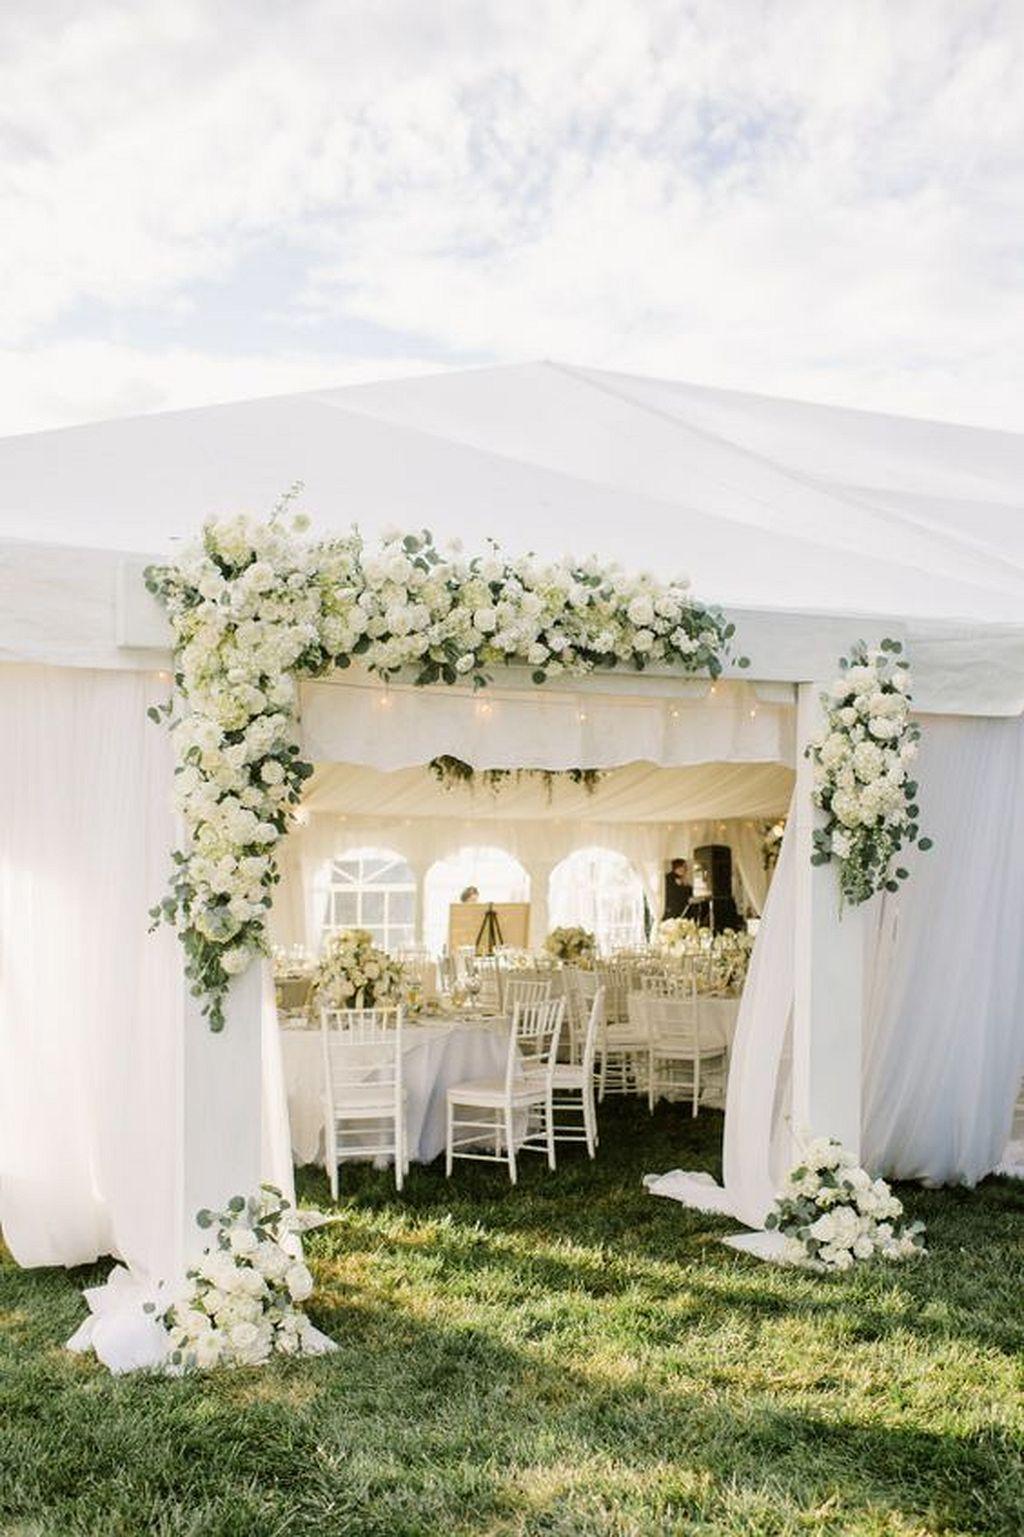 Wedding tent decoration images  Pin by rebecca freeman on wedding  Pinterest  Wedding tent